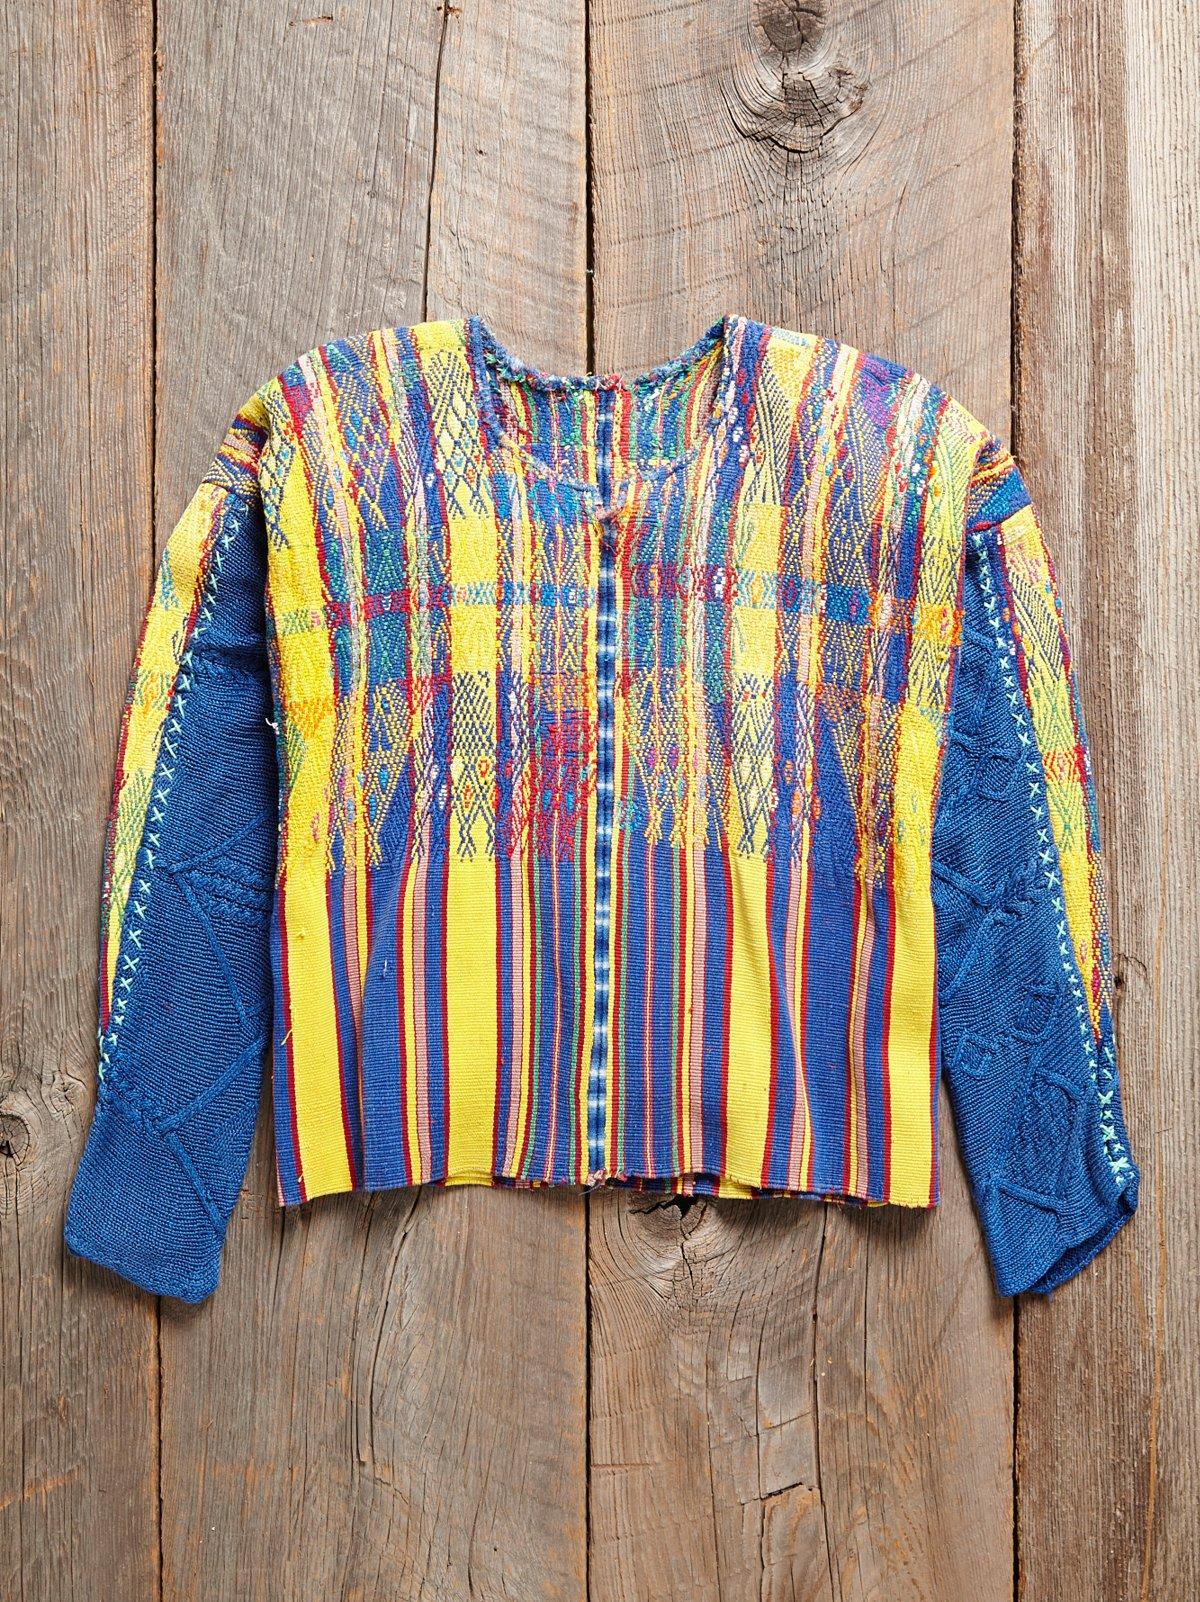 Vintage Guatemalan Woven Sweater